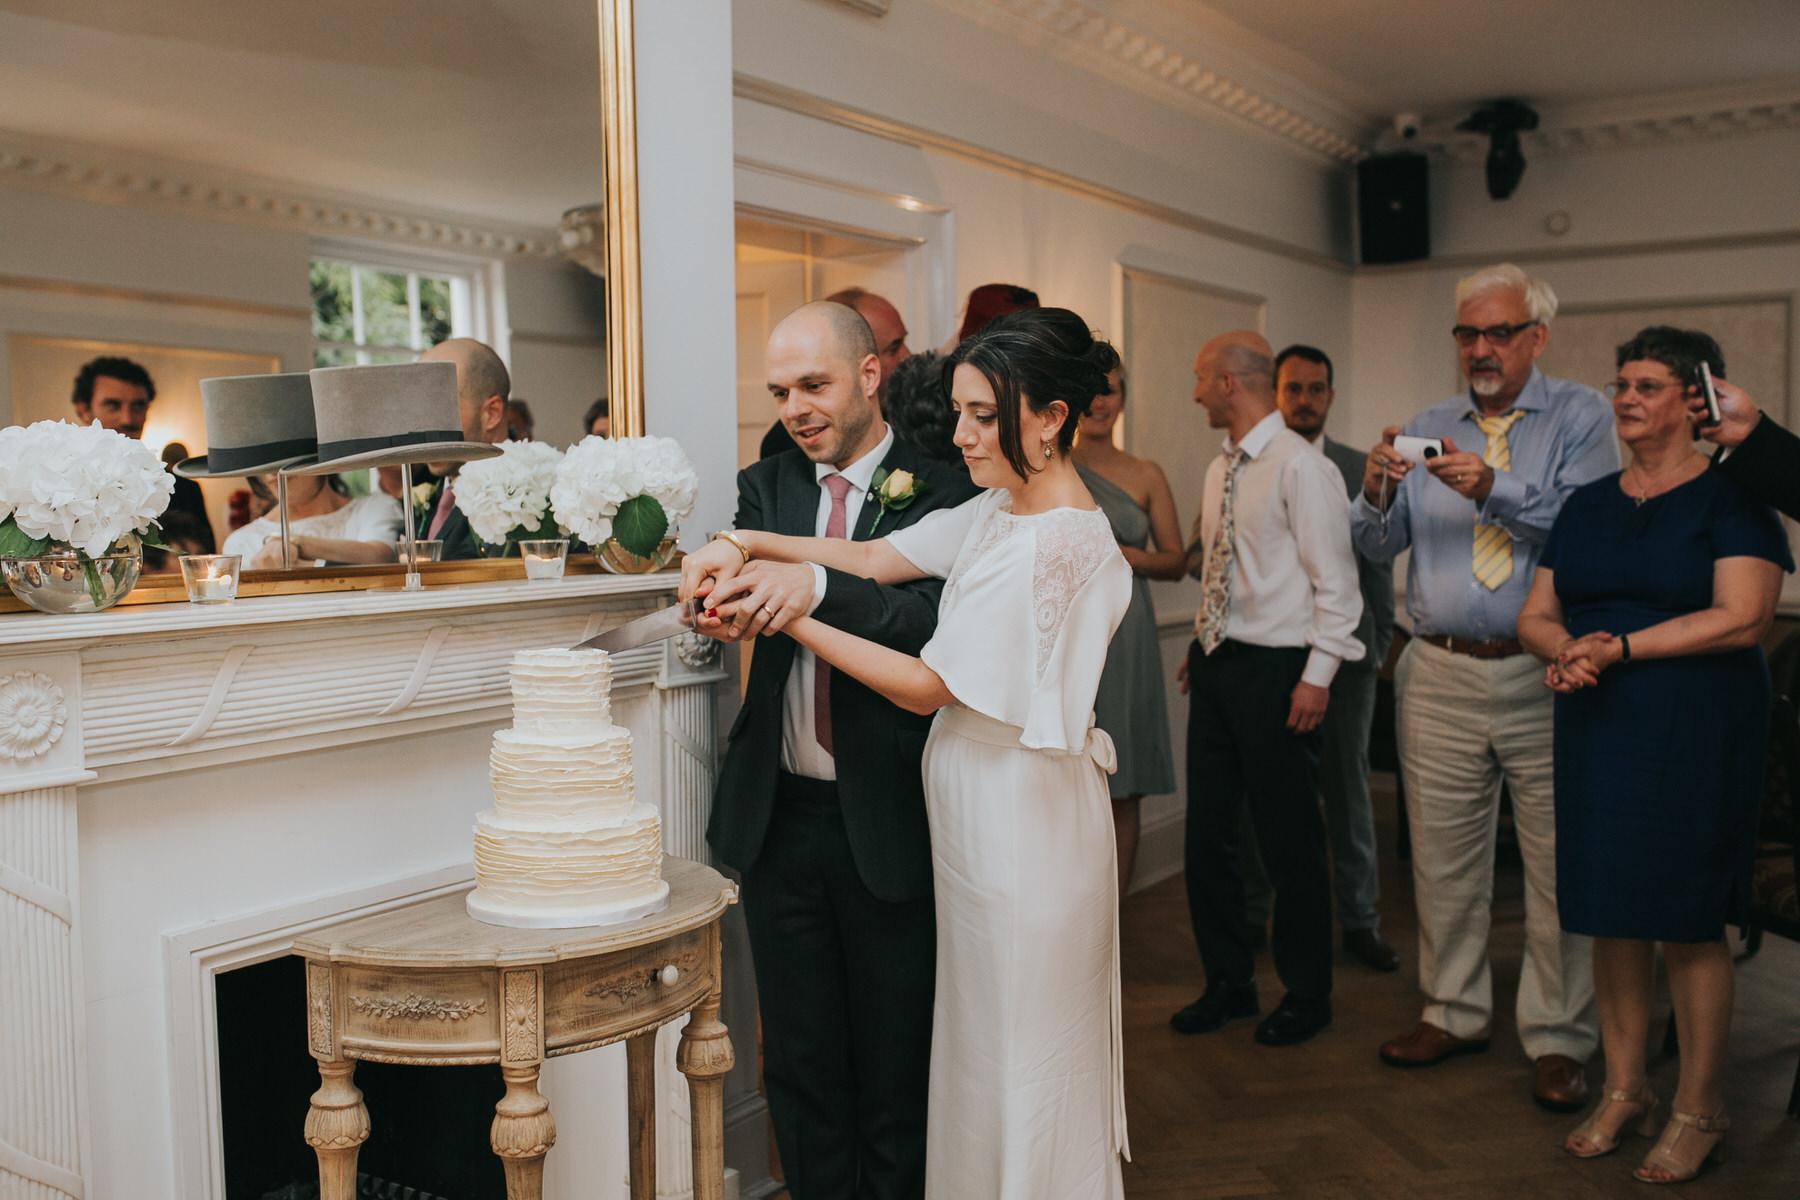 323-Belair House bride groom cut elegant minimalist cream cake.jpg